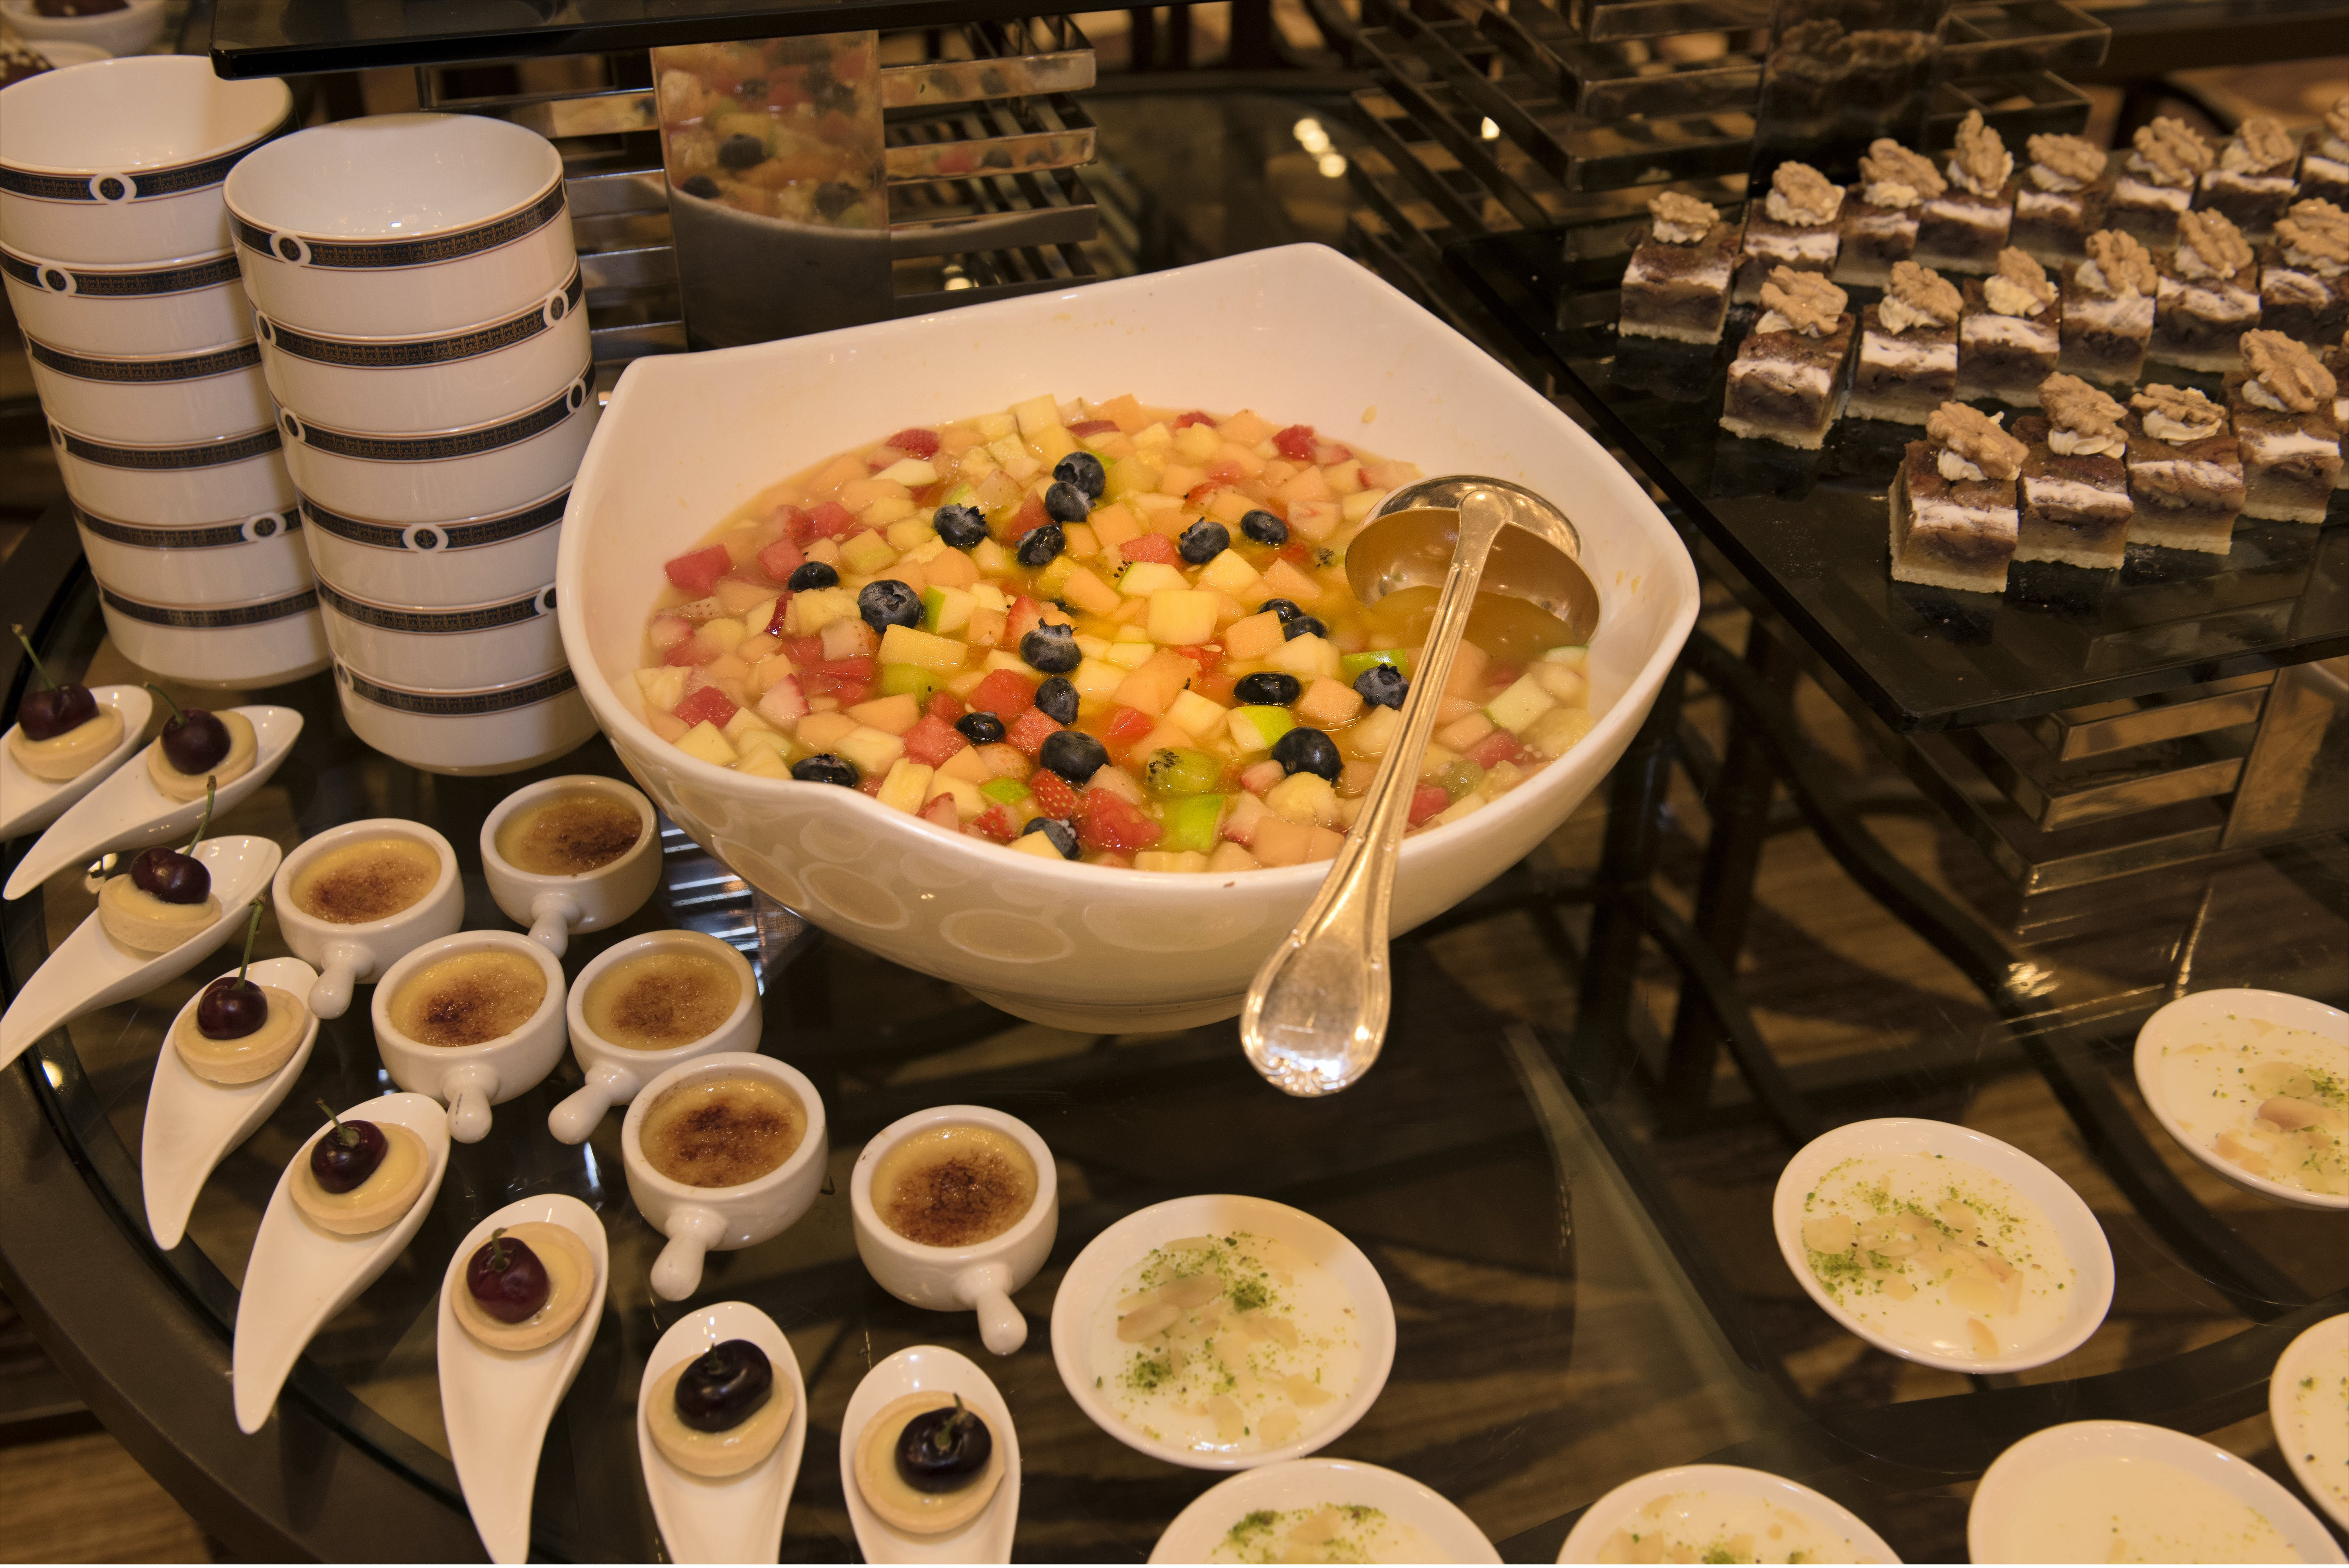 Free stock photo of food, pudding, sweets, fruitsalad